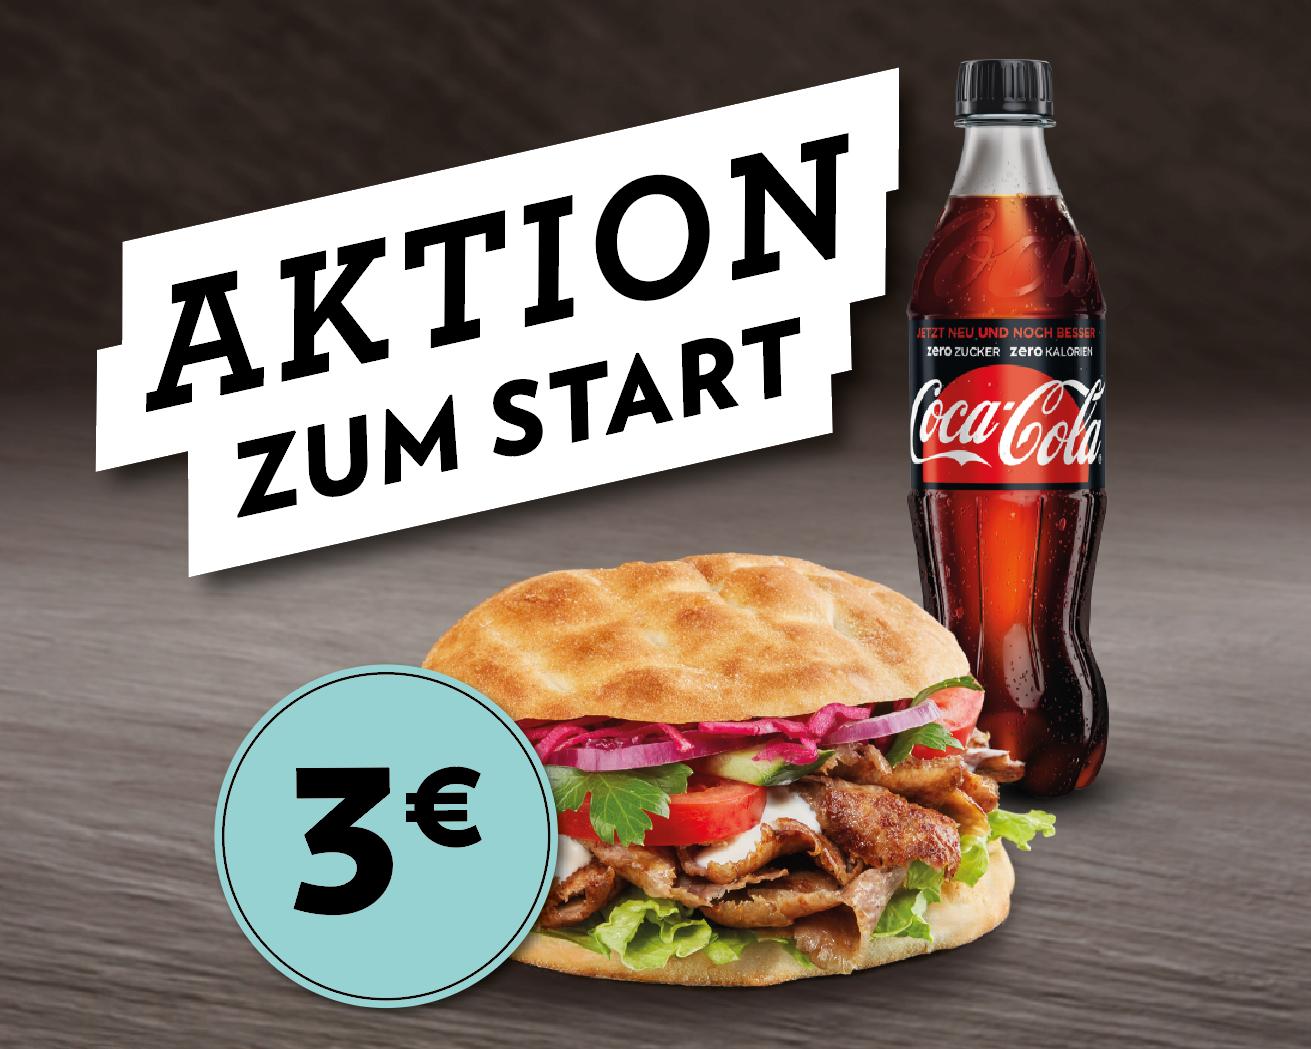 Türkis in Wien Mitte - Start Aktion (Kebab/Falafel/Pide/Lahmacun + Getränk = 3€)